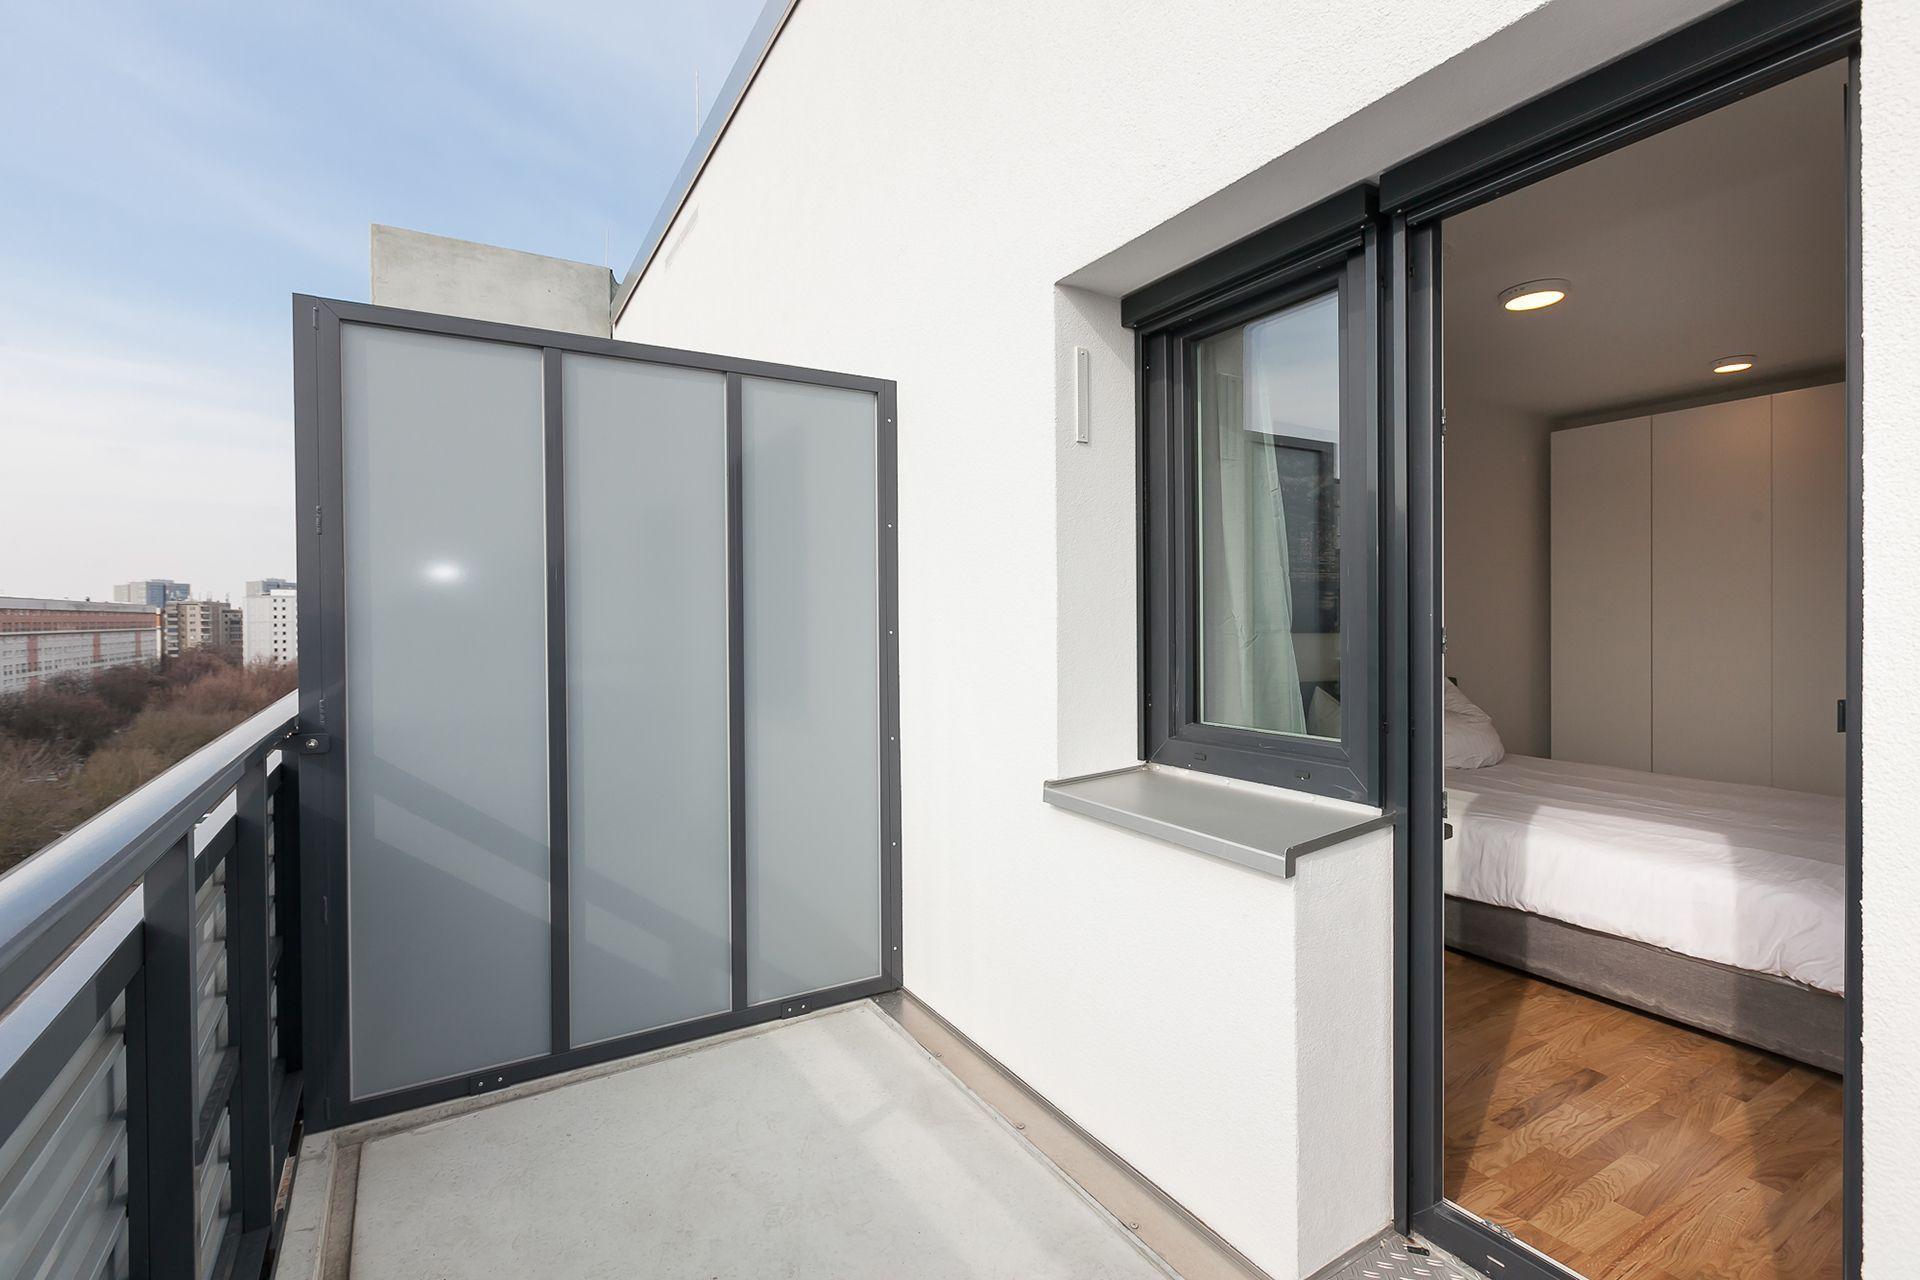 1 Bedroom - Small apartment to rent in Berlin KOEP-KOEP-0411-0